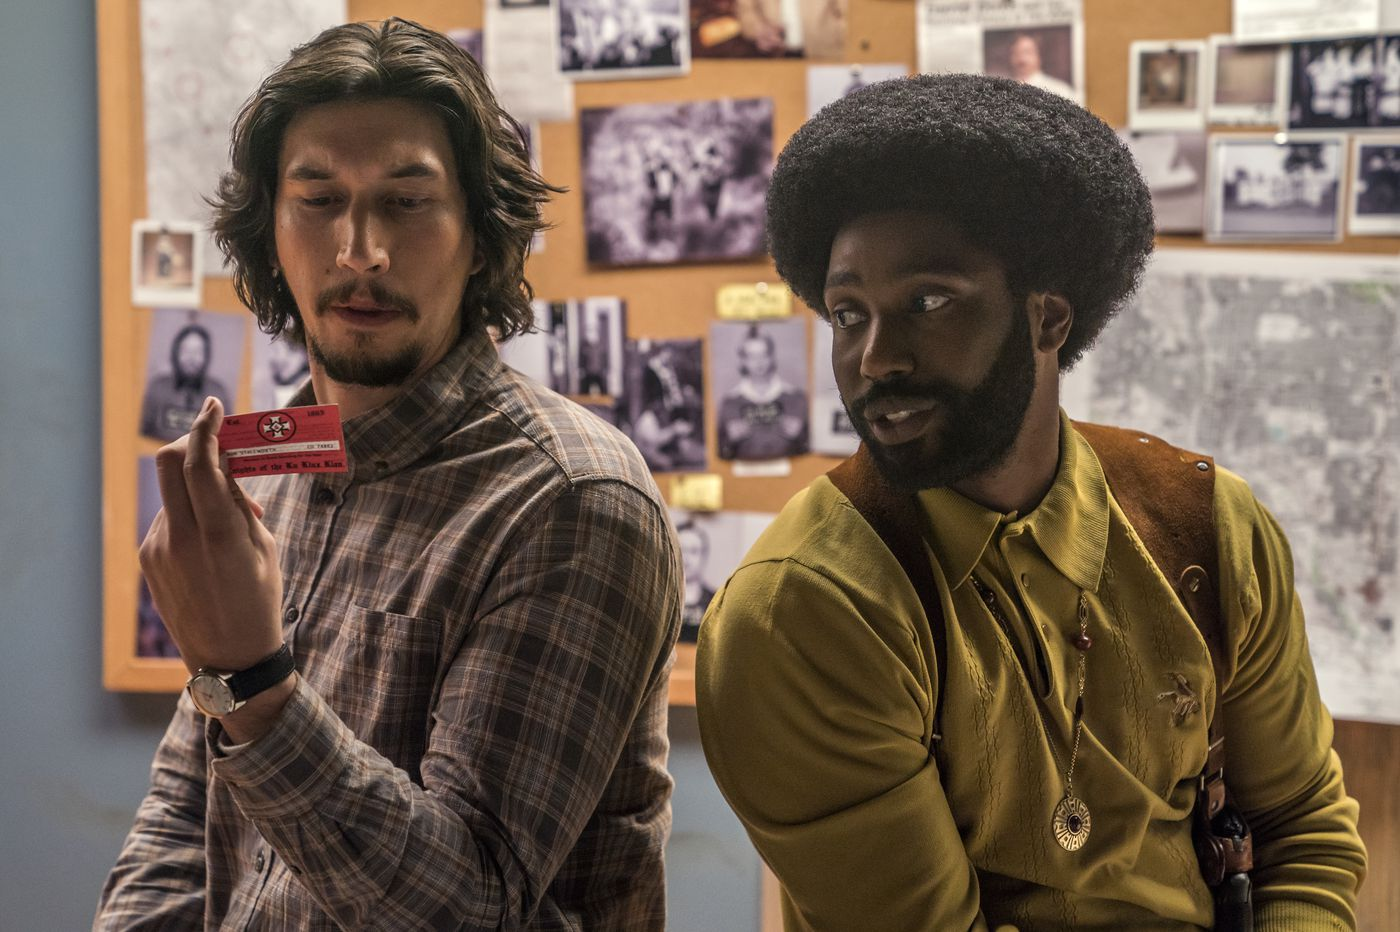 'BlacKkKlansman': Spike Lee brings an amazing true story to the big screen